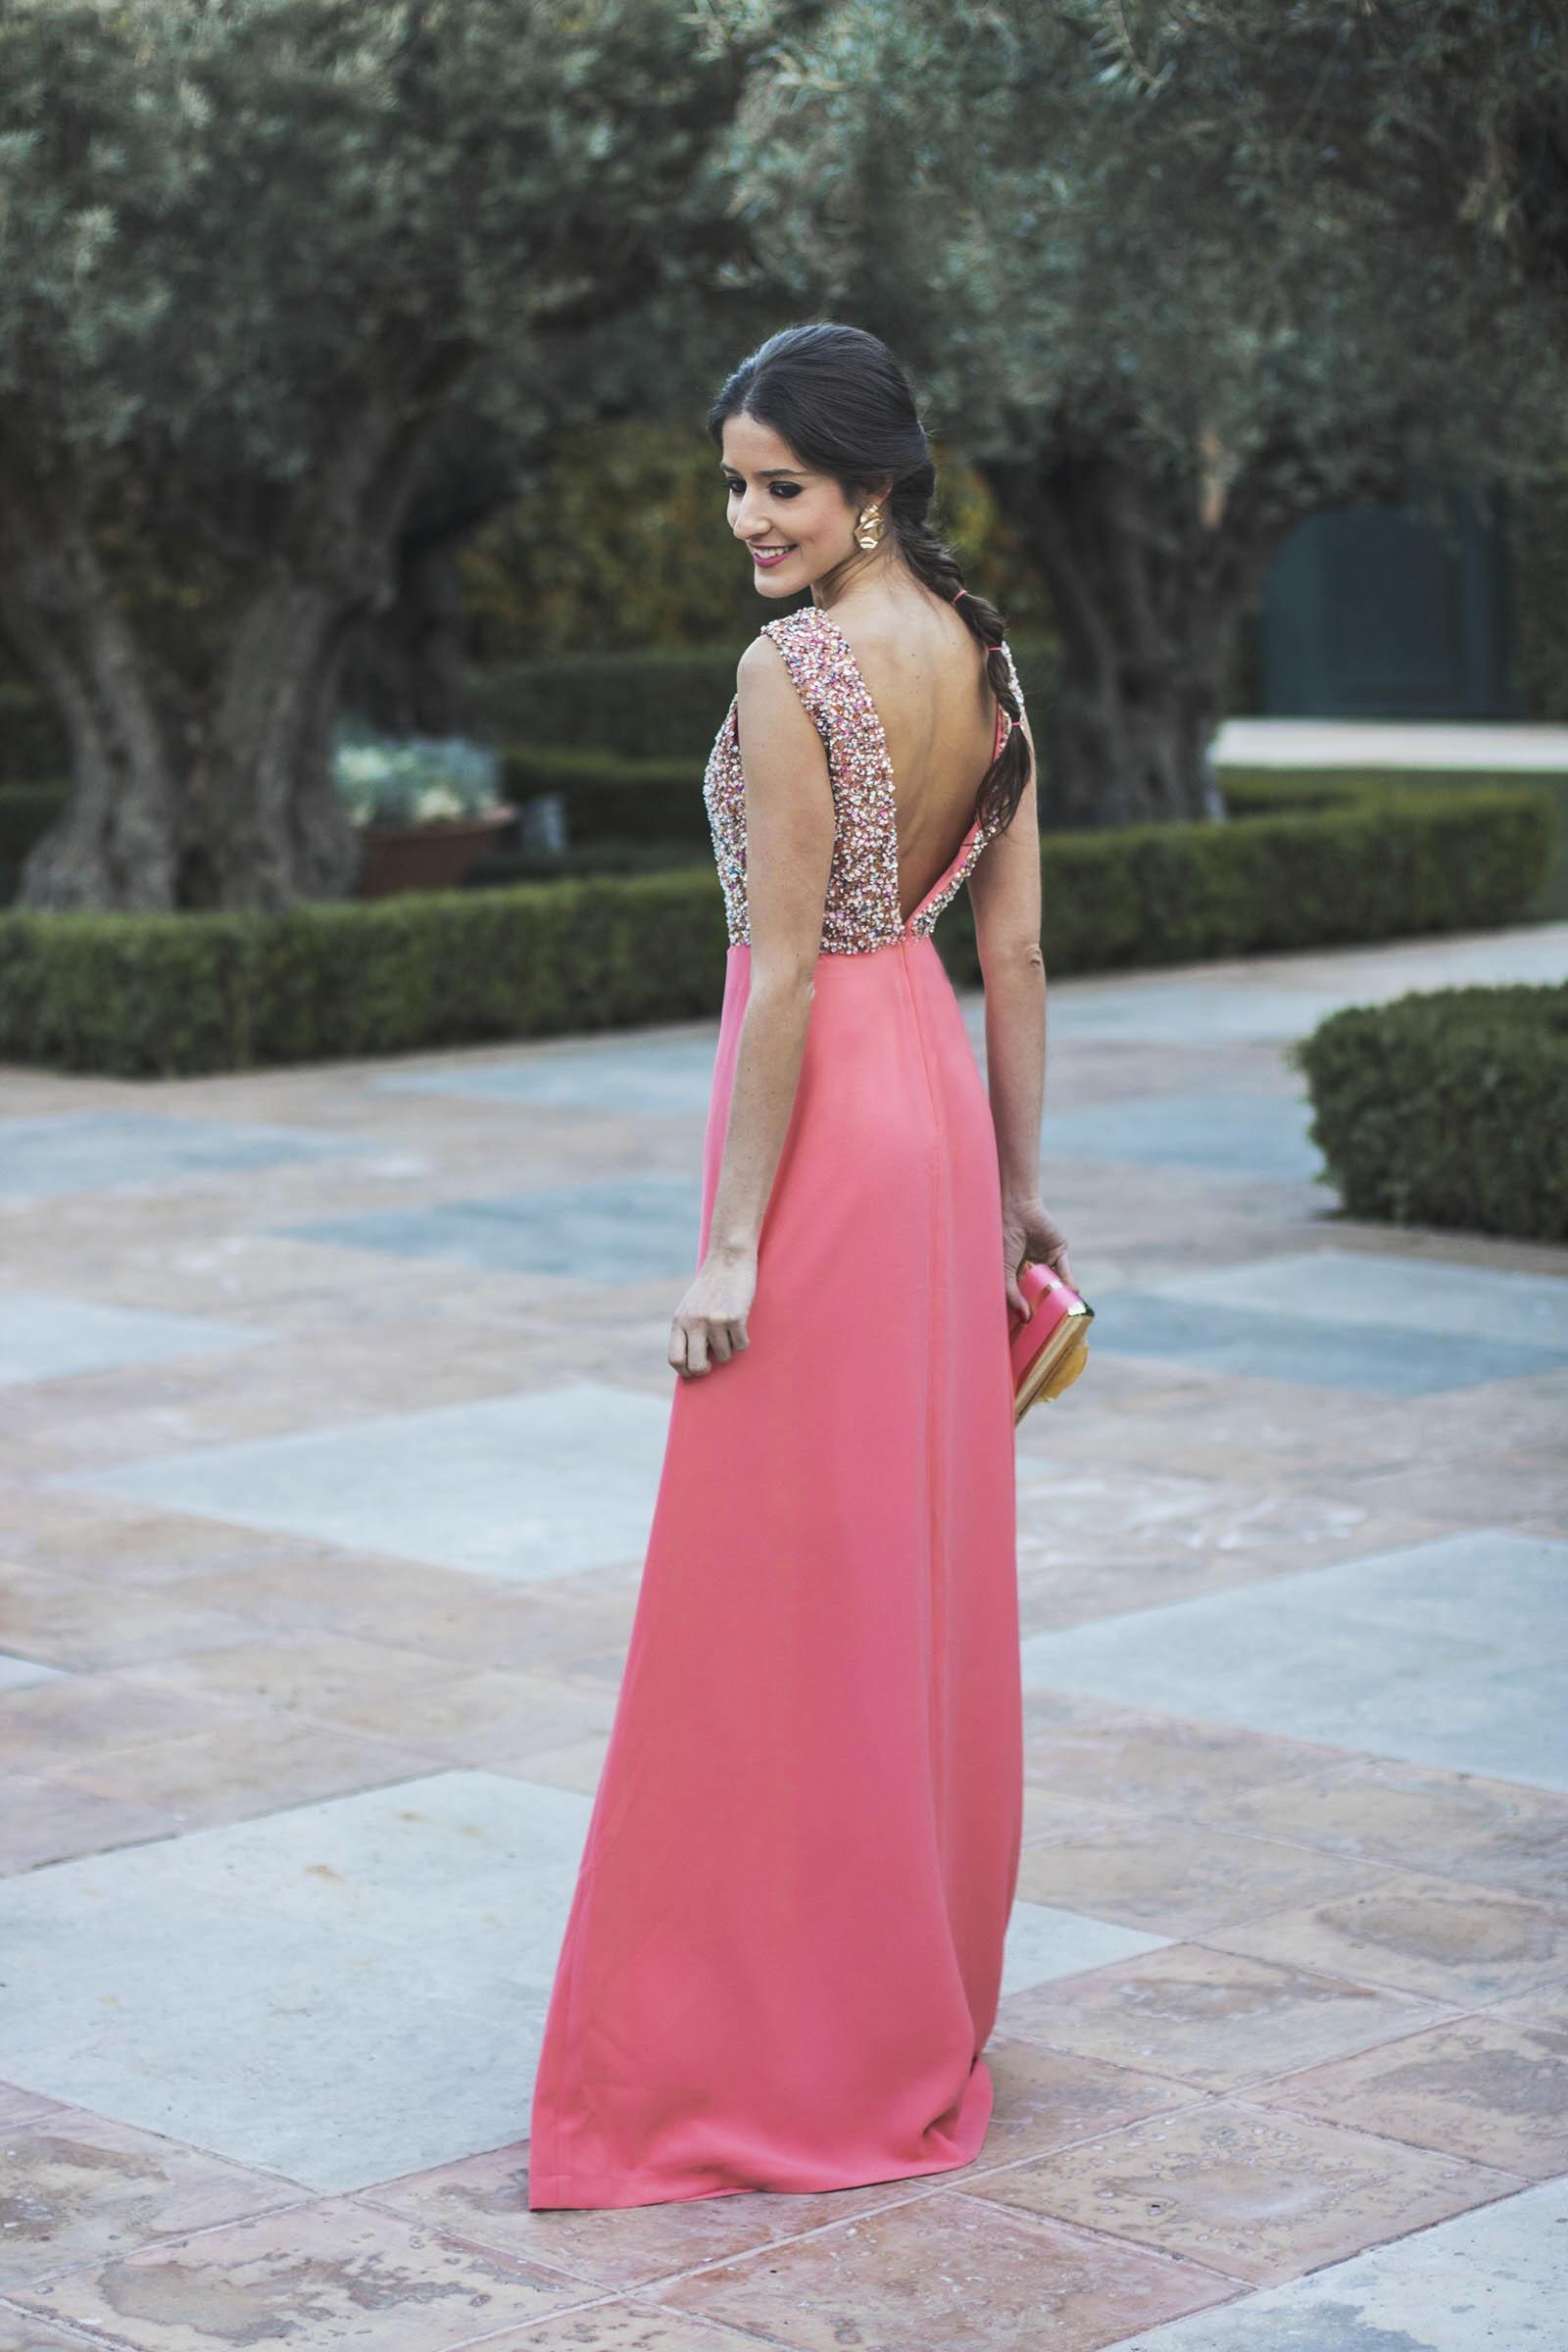 Famoso Vestido De Novia Tintorerías Galería - Colección de Vestidos ...